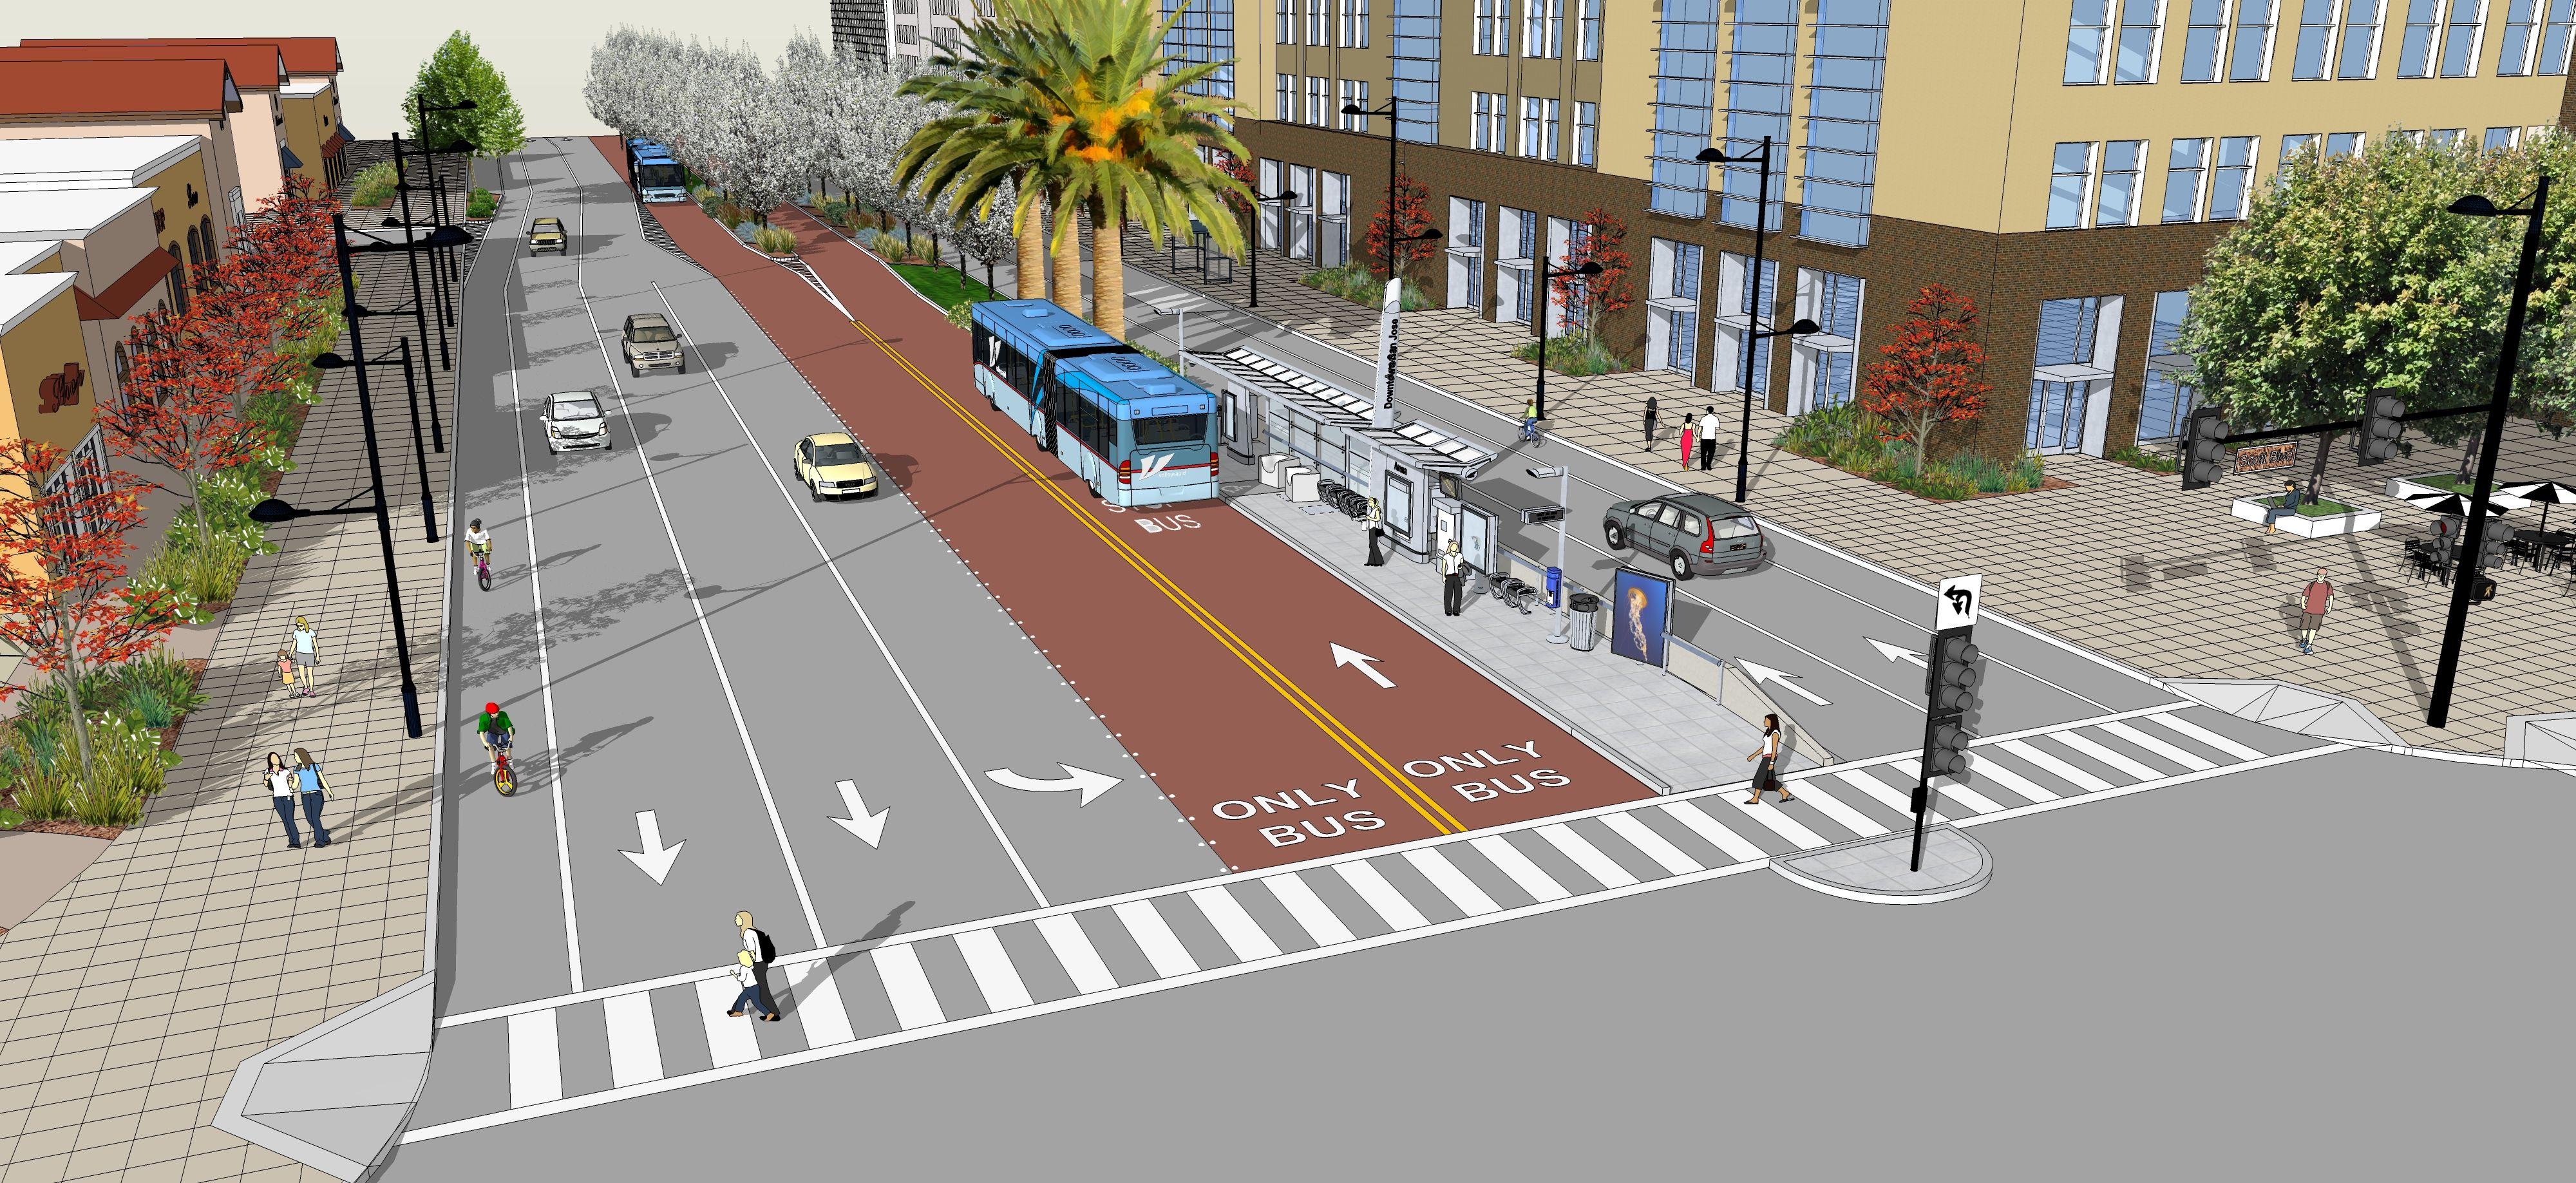 view simulation of bus operating in dedicated lane in median